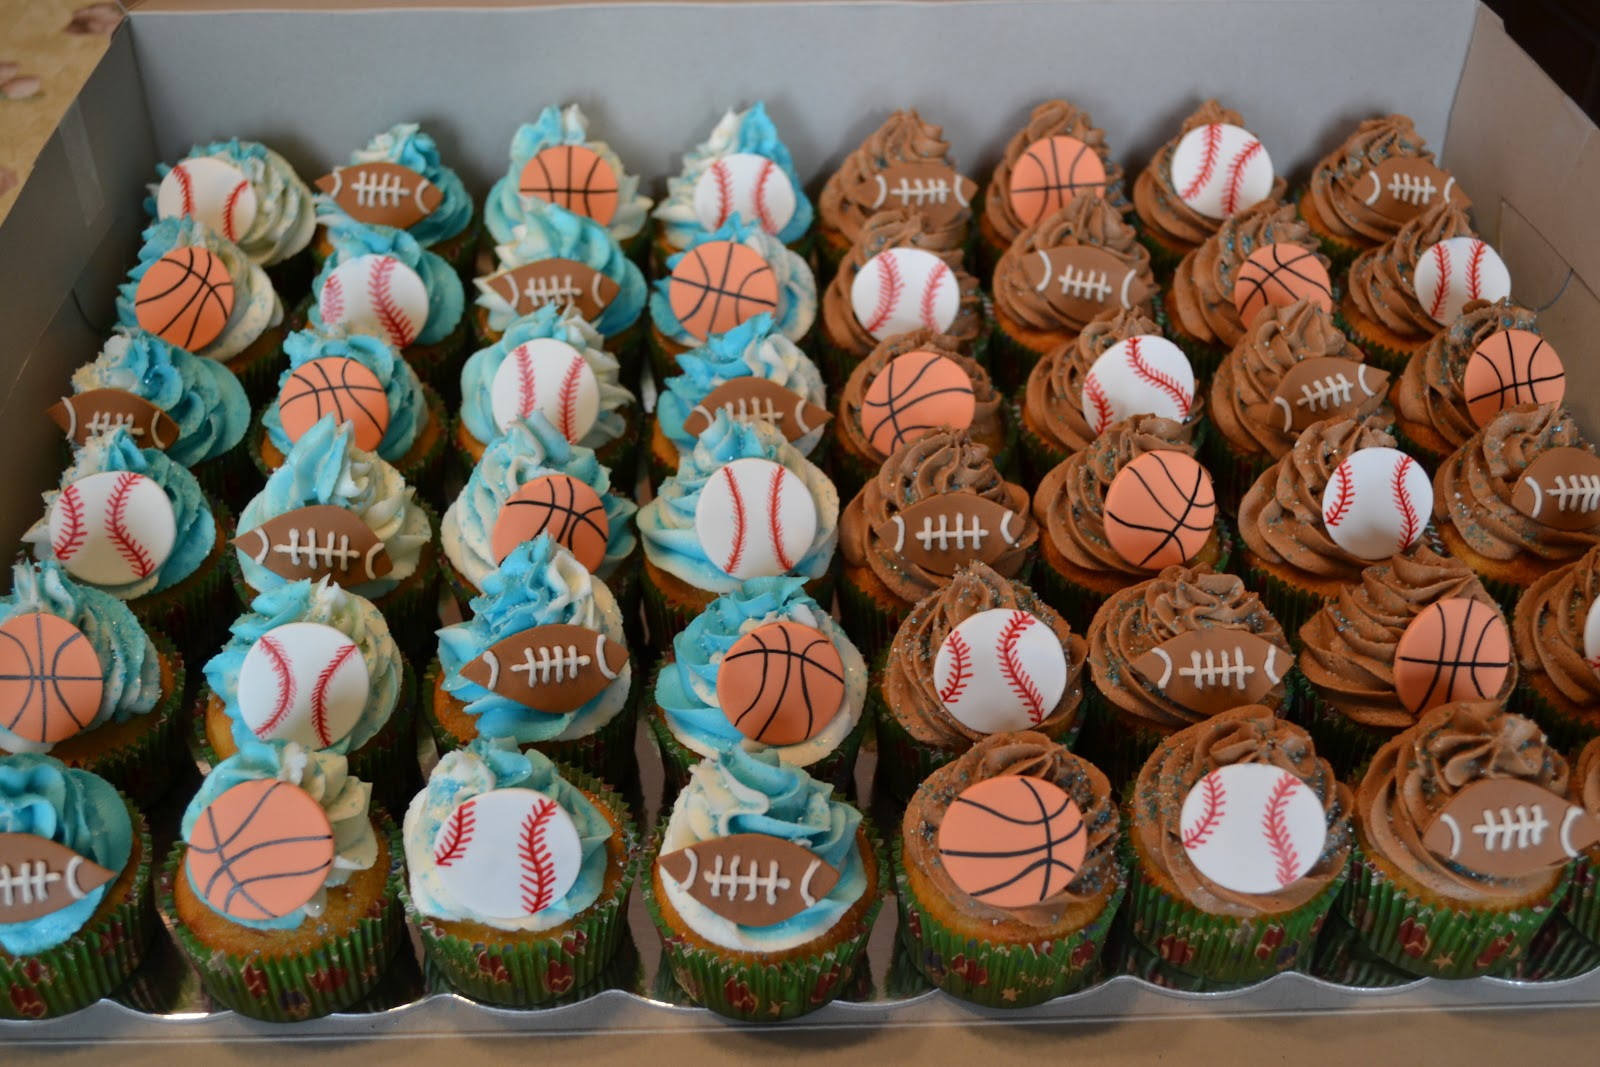 The Crocheted Cupcake Jacks 7th Birthday Cake Cupcakes Sports